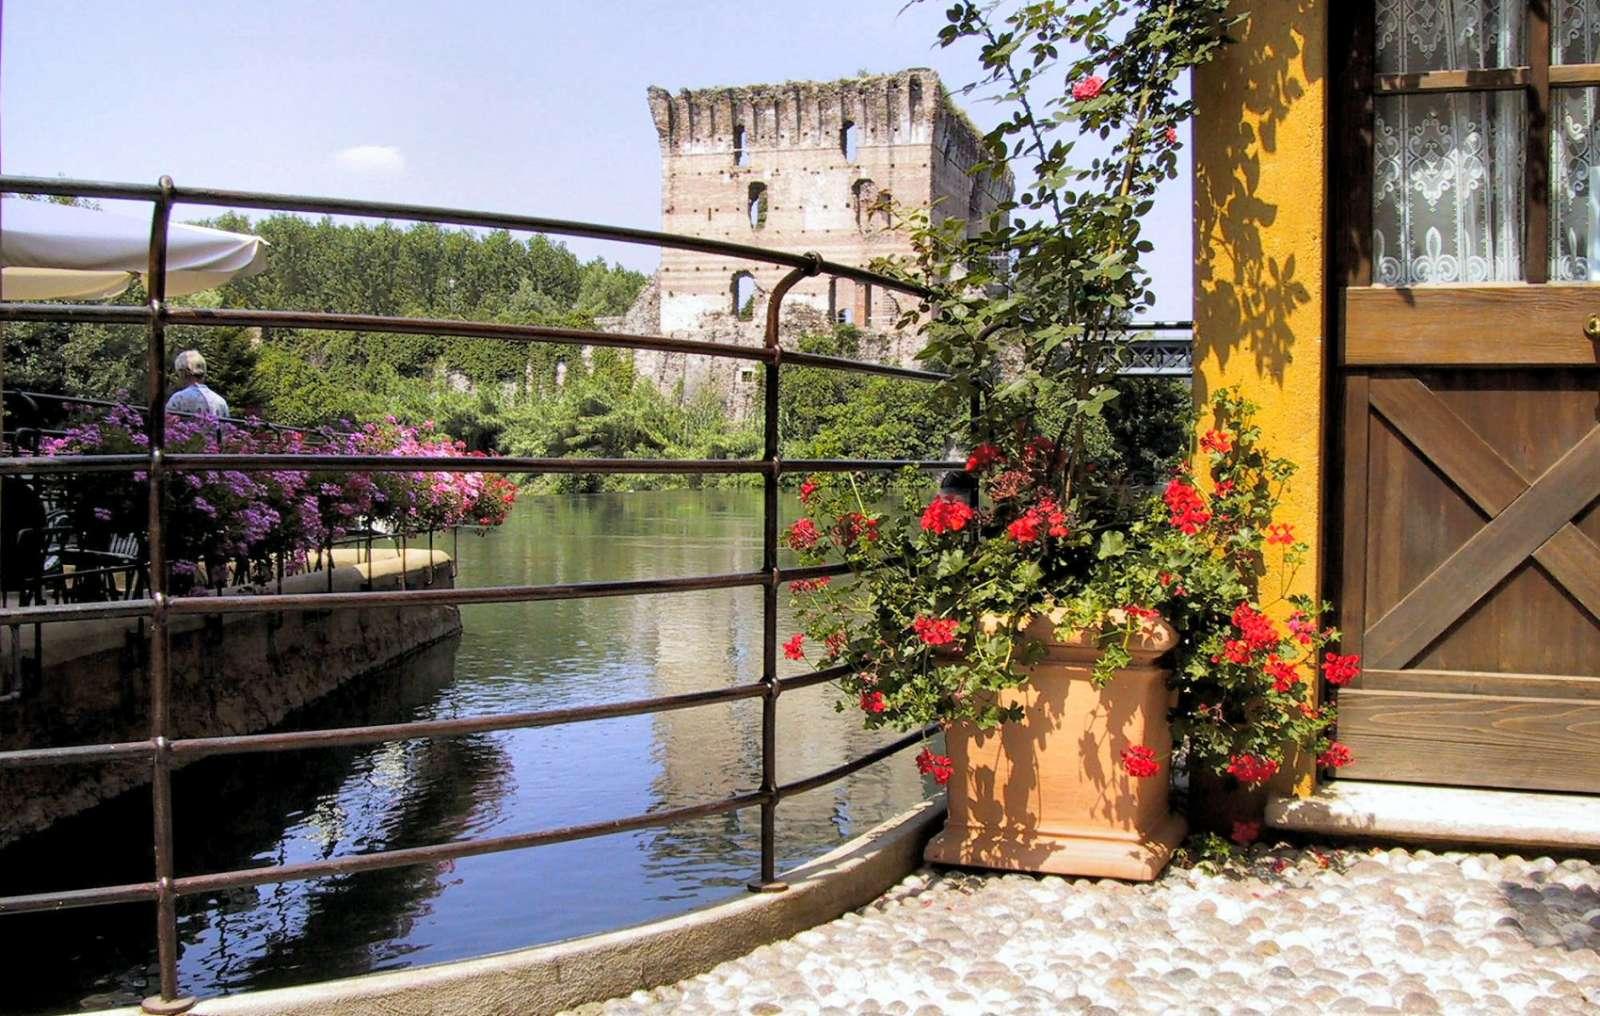 Udsigt fra Il Borghetto mod broen Ponte Visconteo